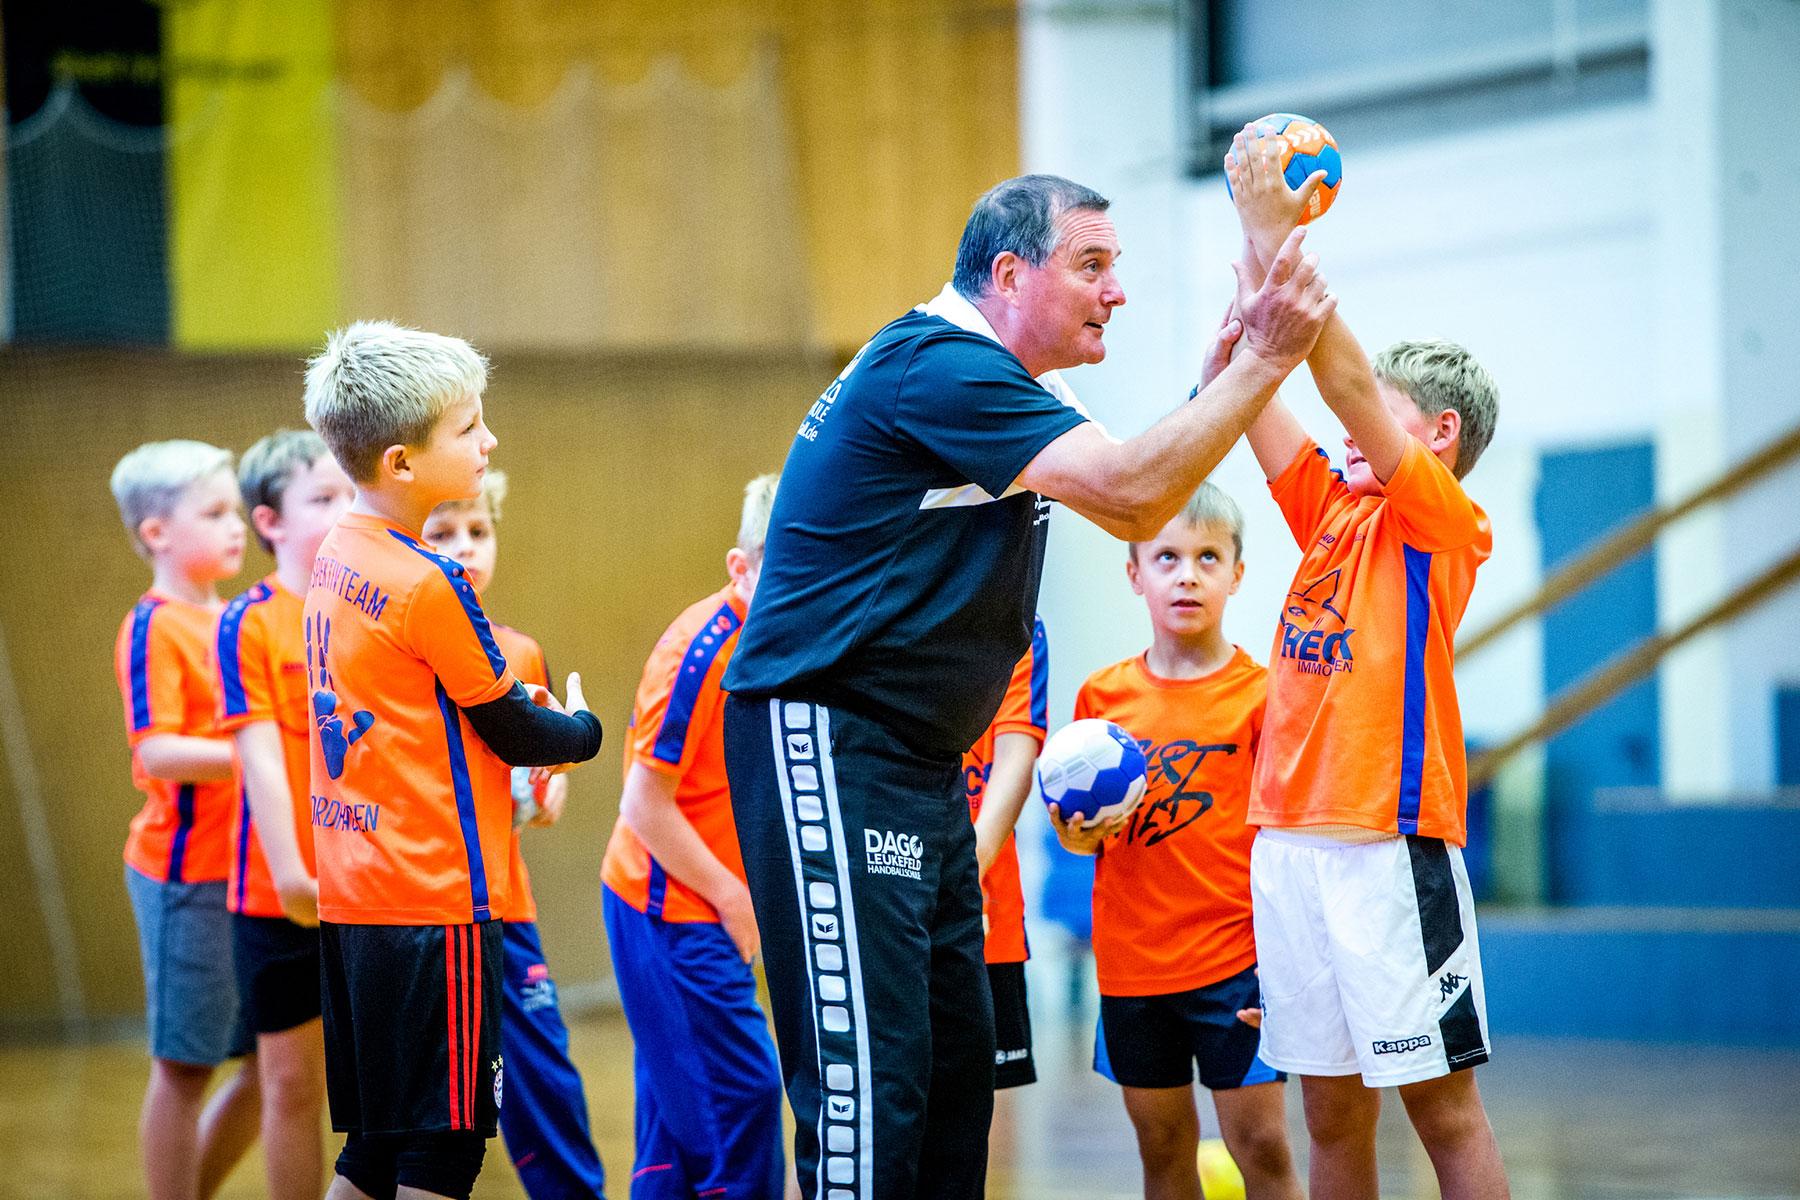 201809_Handballcamp_NDH (11)